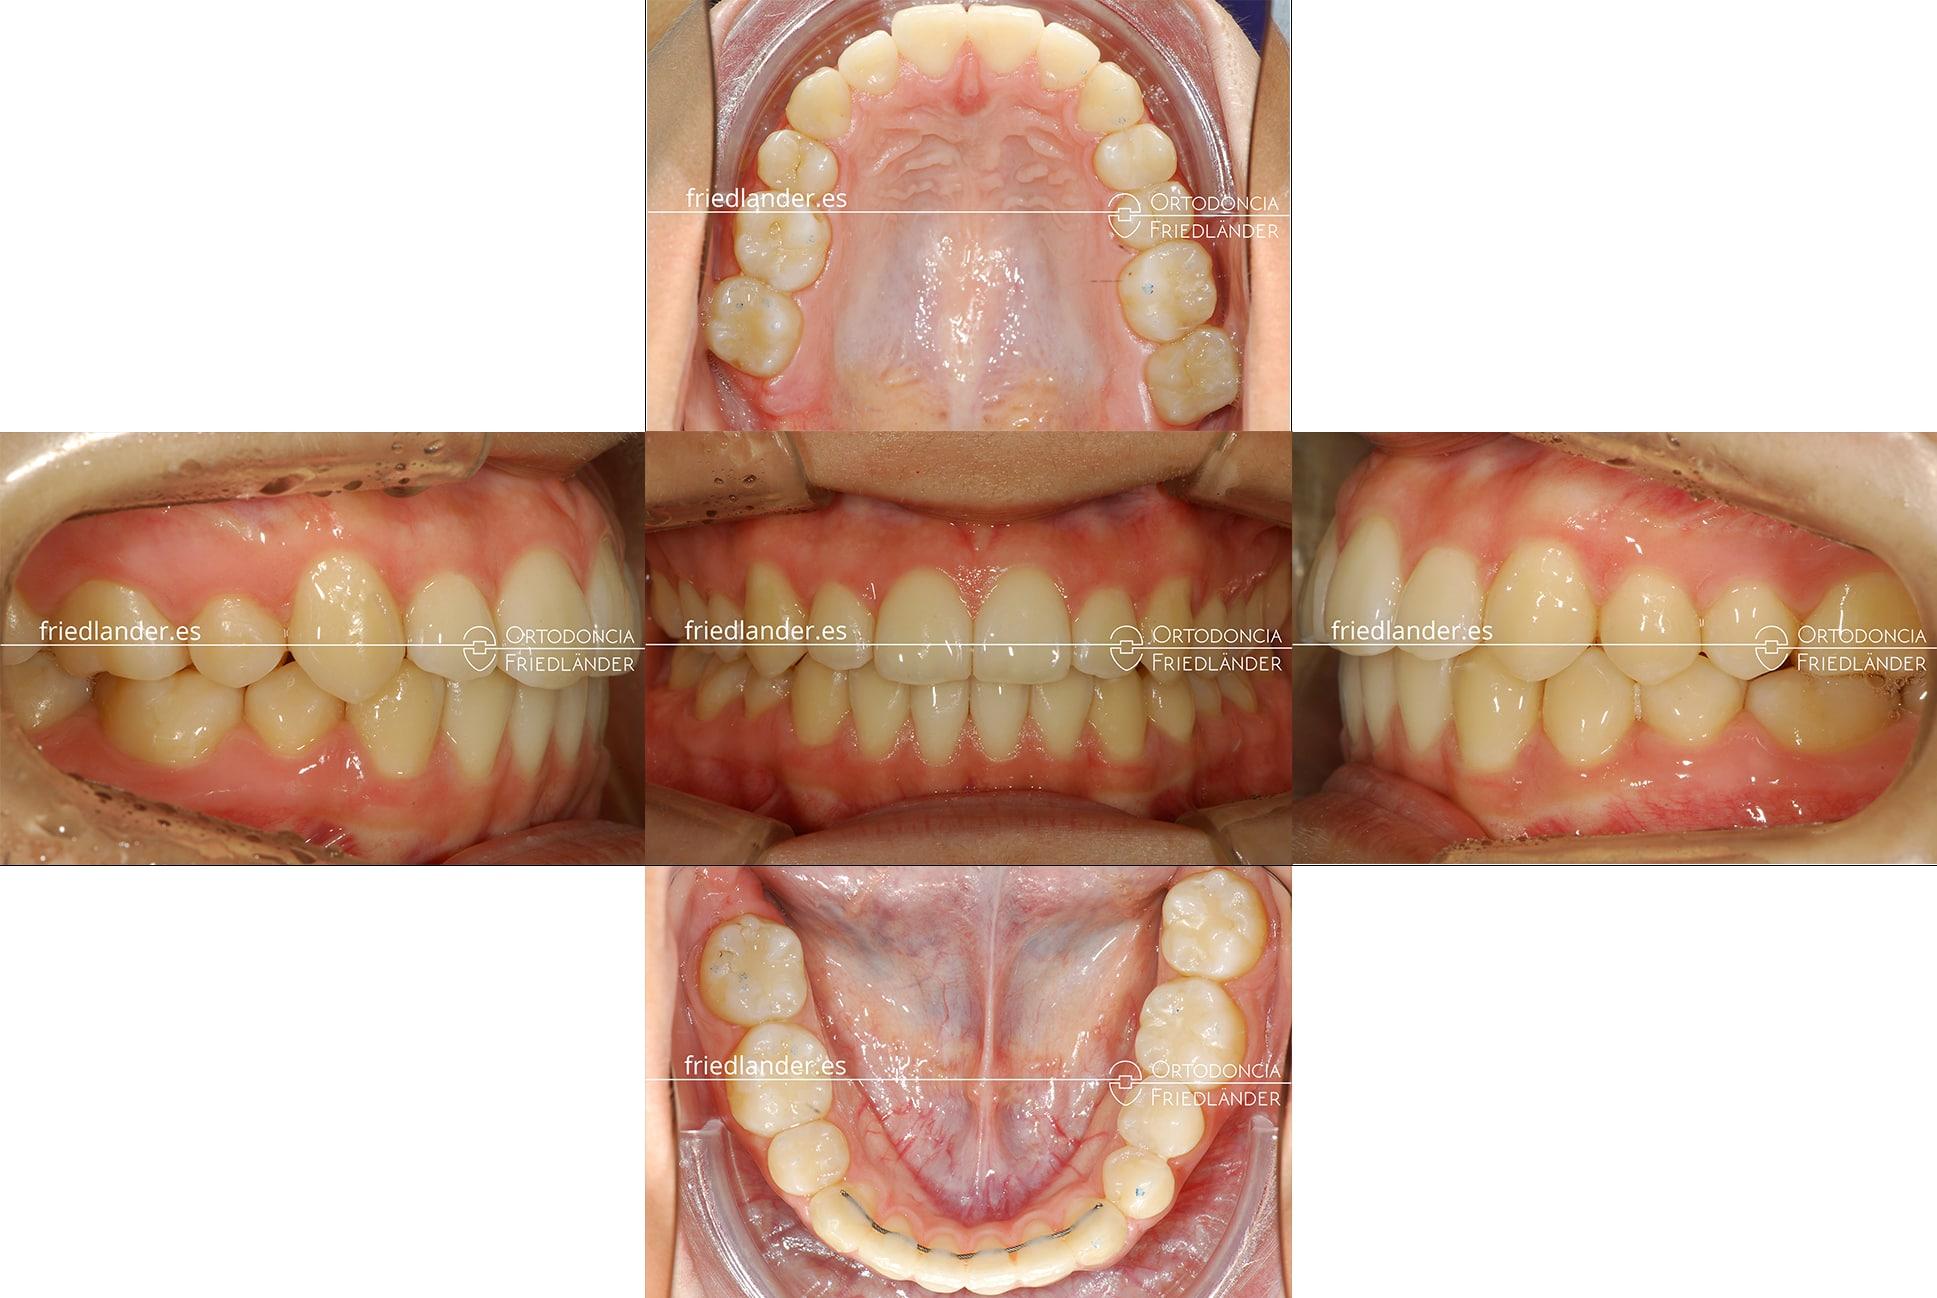 ortodoncia barcelona stripping